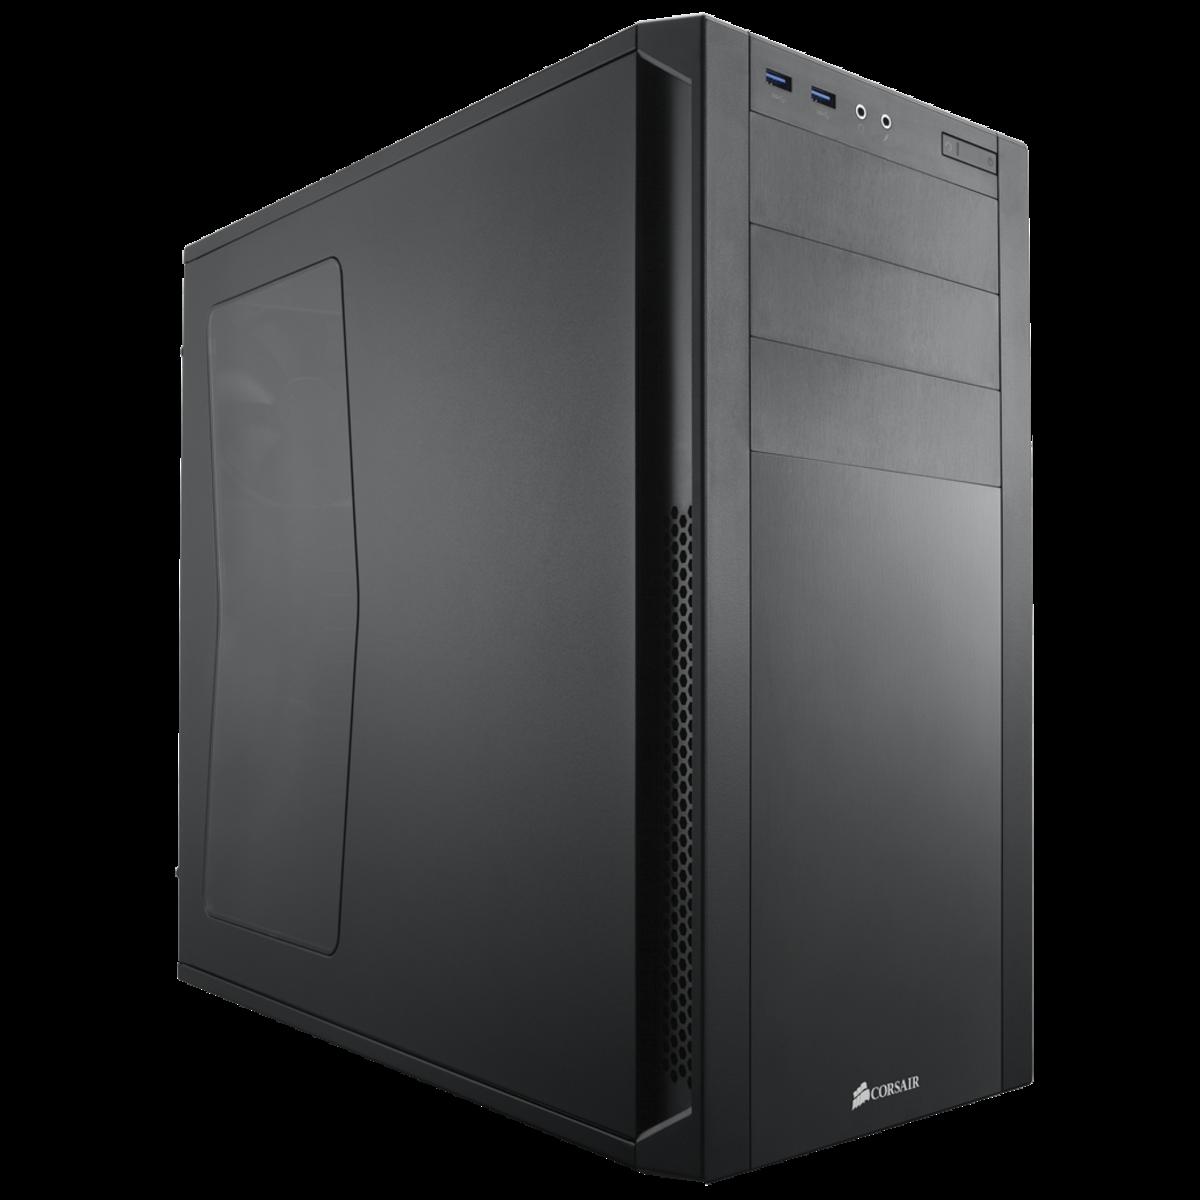 Universal i9-Extreme Desktop Tower System (Discrete Video)